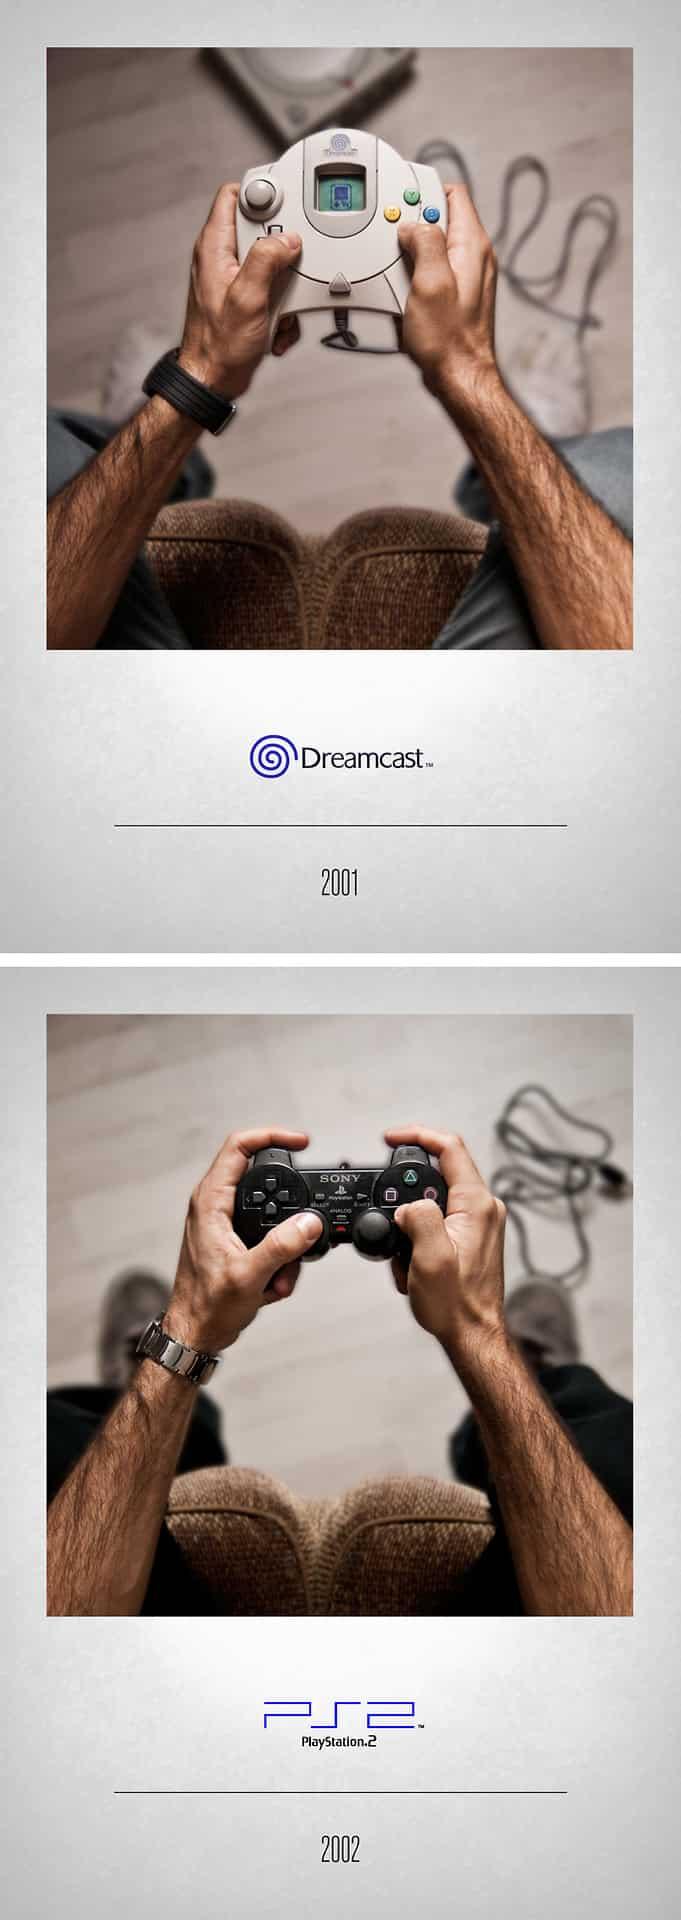 console-pad (5)